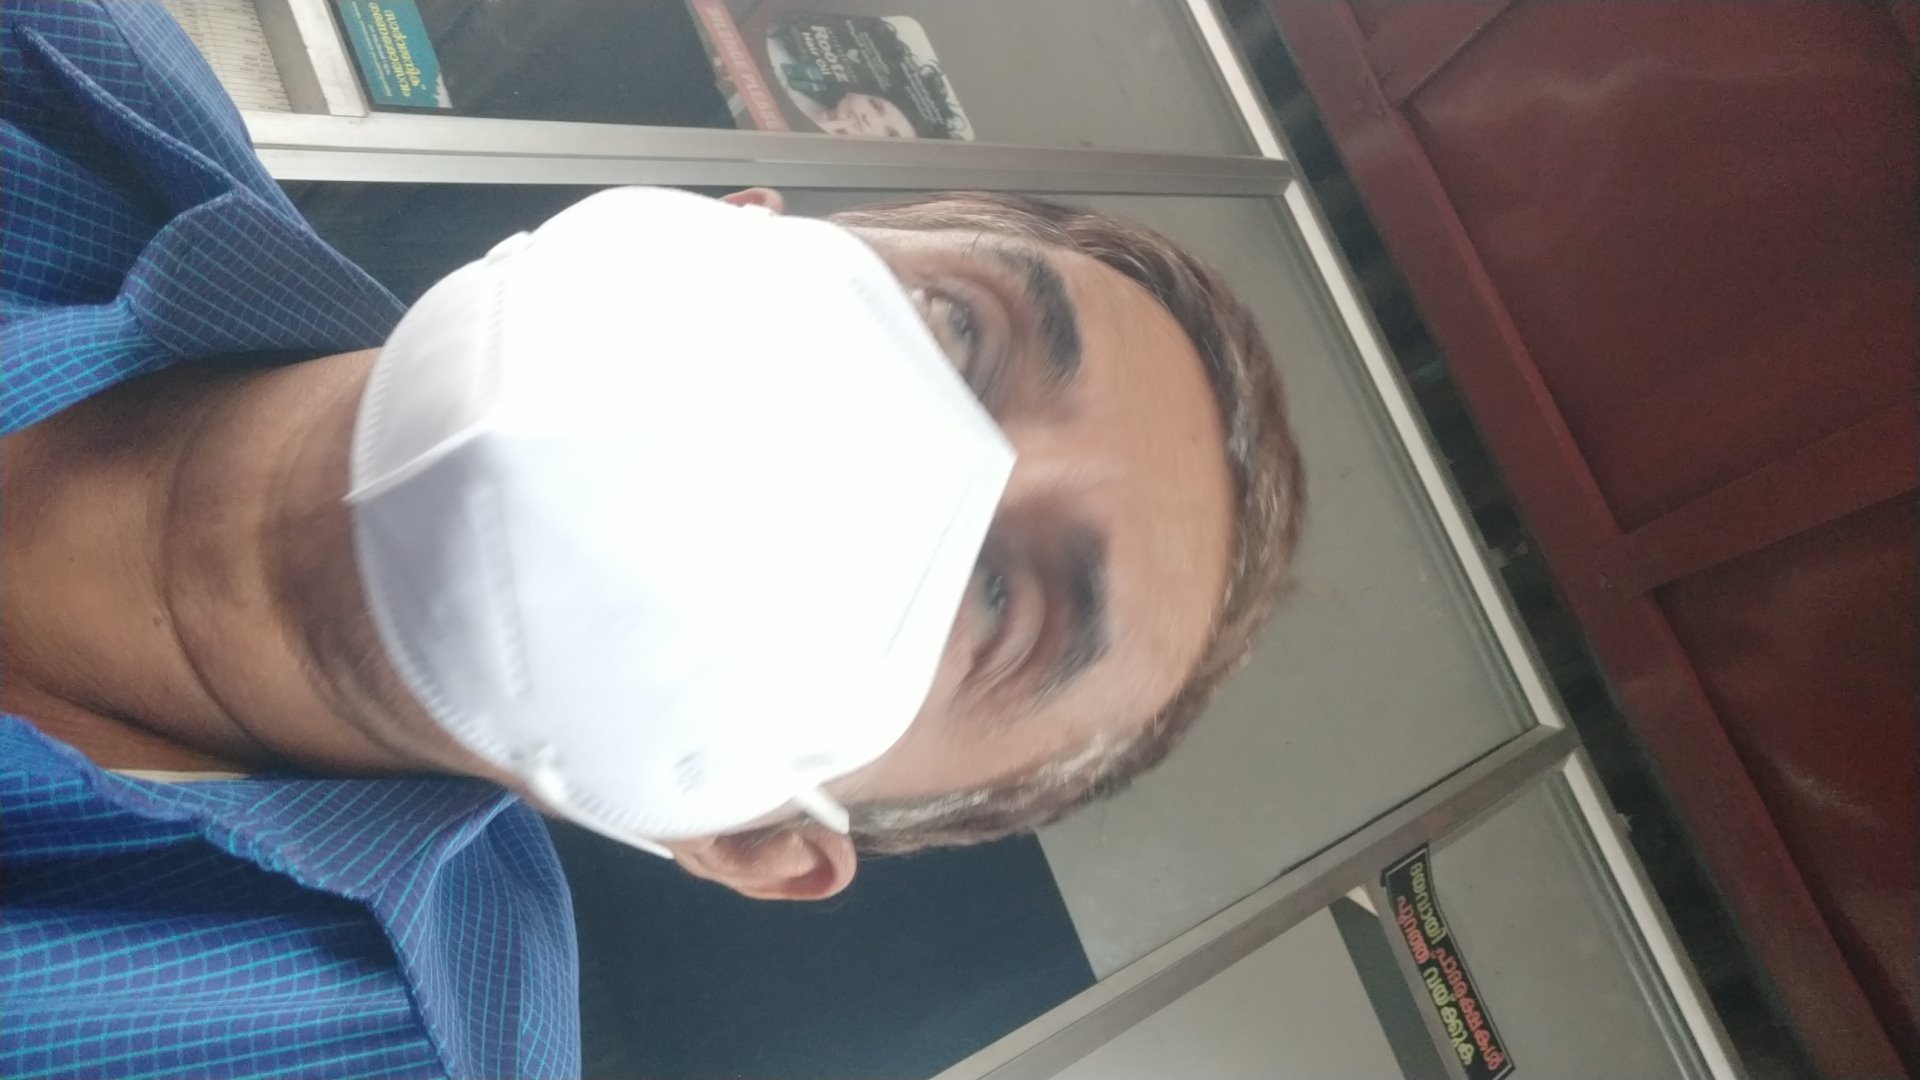 Dr. Paramesearasarma Sarma